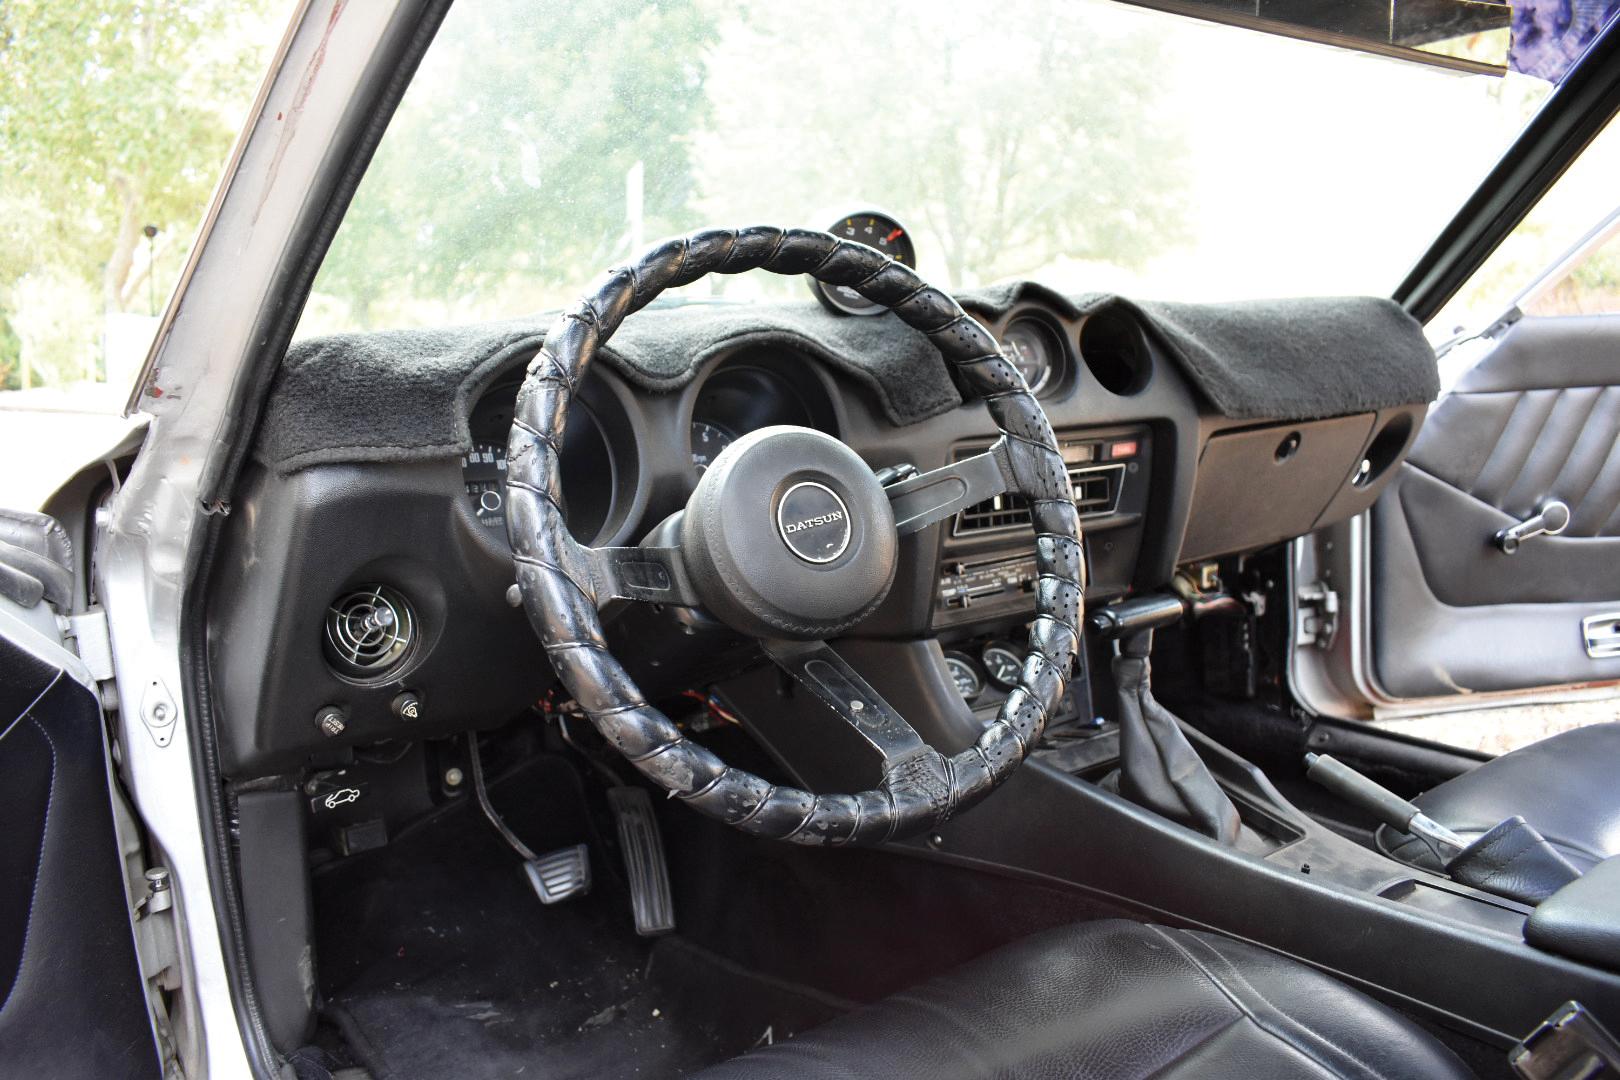 INTERIOR SHOT (DRIVER).jpg